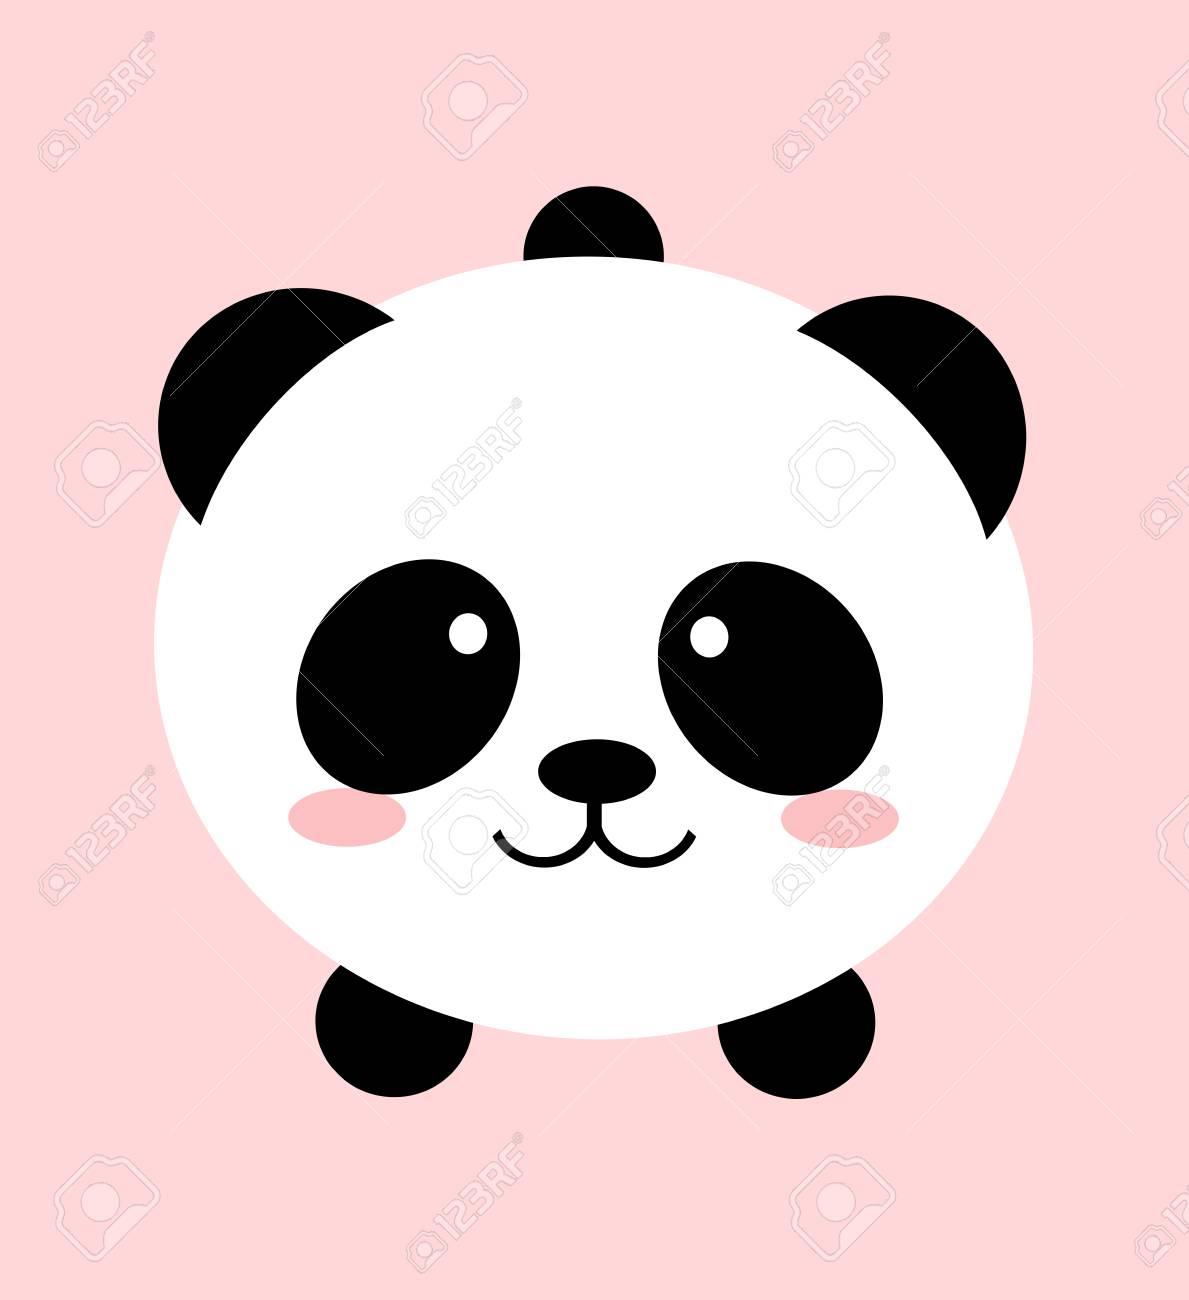 Digital Design Of A Lovely Cute Kawaii Panda Bear Over